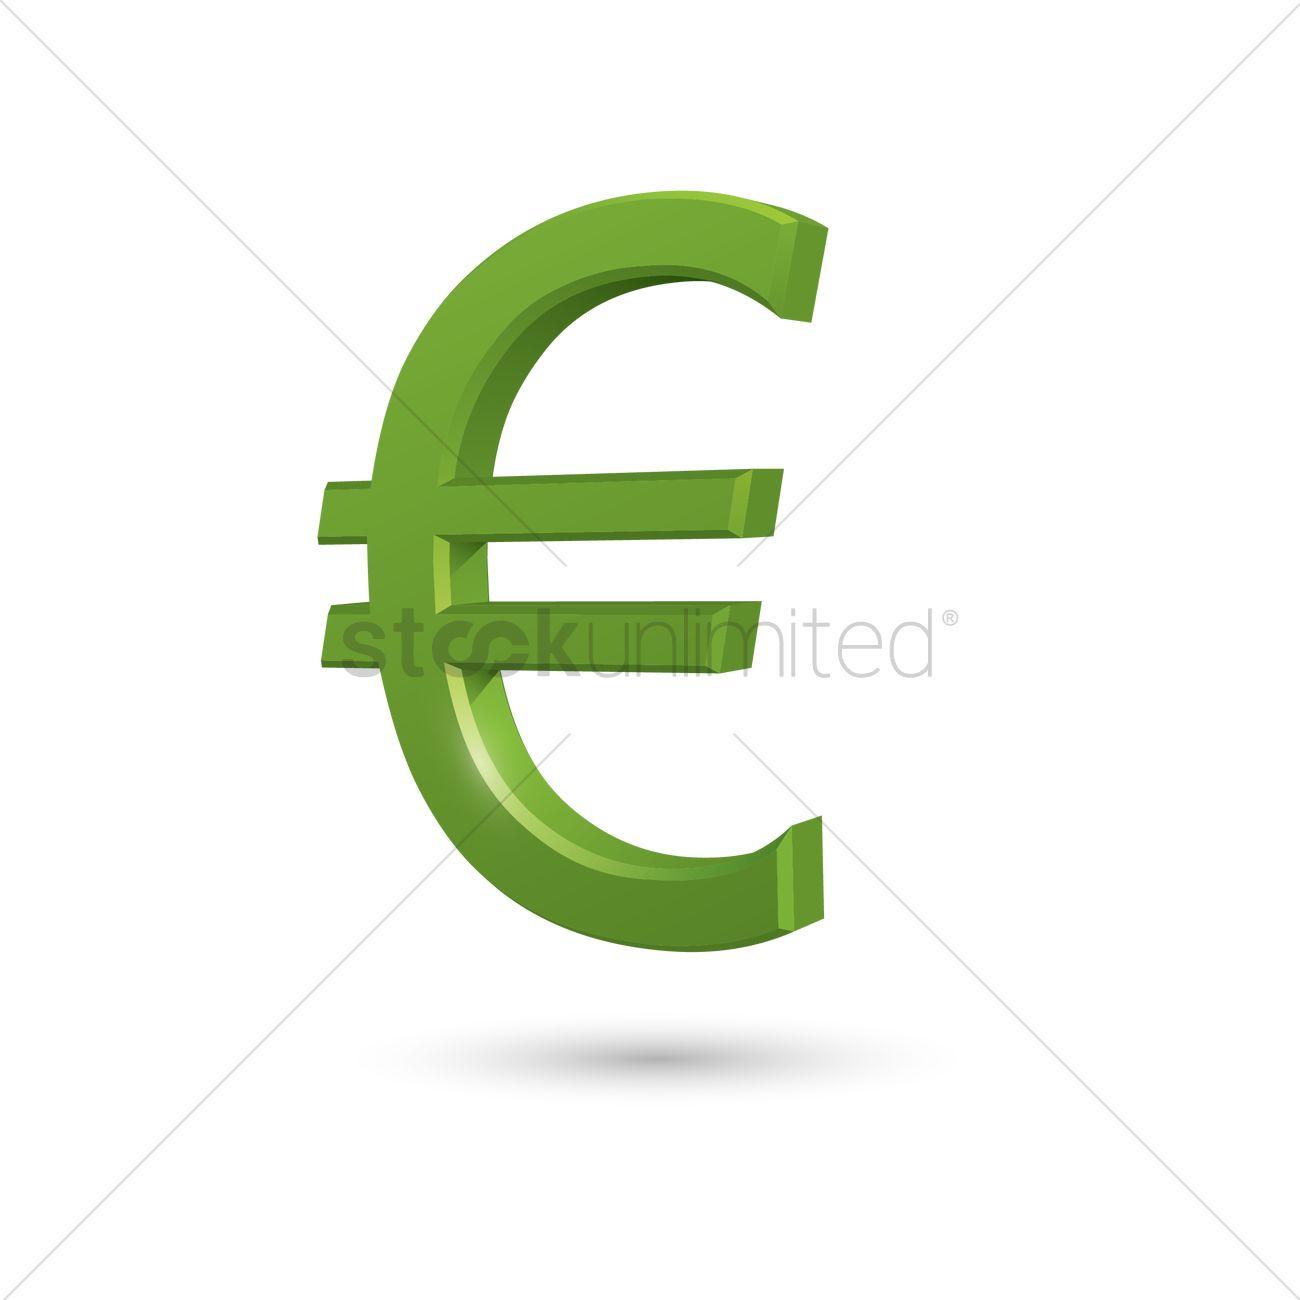 Euro Symbol Vector Image 1572062 Stockunlimited